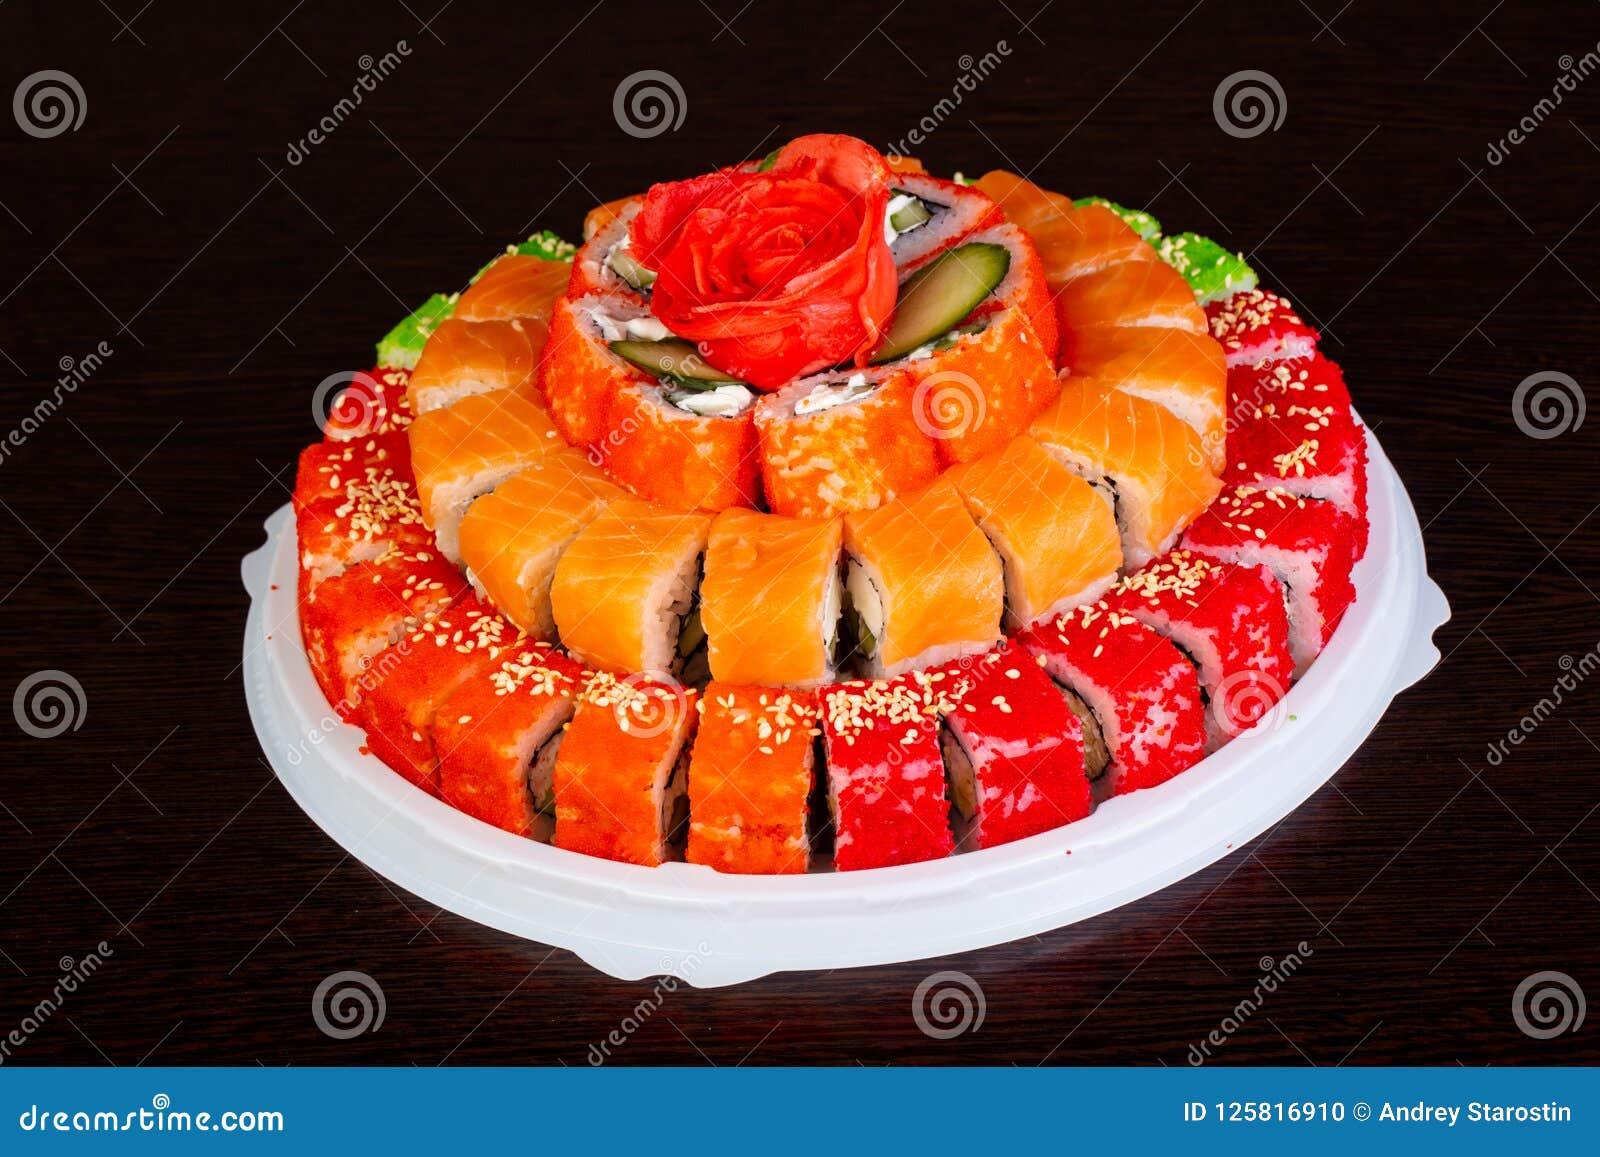 Miraculous Philadelphia Roll Cake Stock Photo Image Of Food Rice 125816910 Birthday Cards Printable Opercafe Filternl